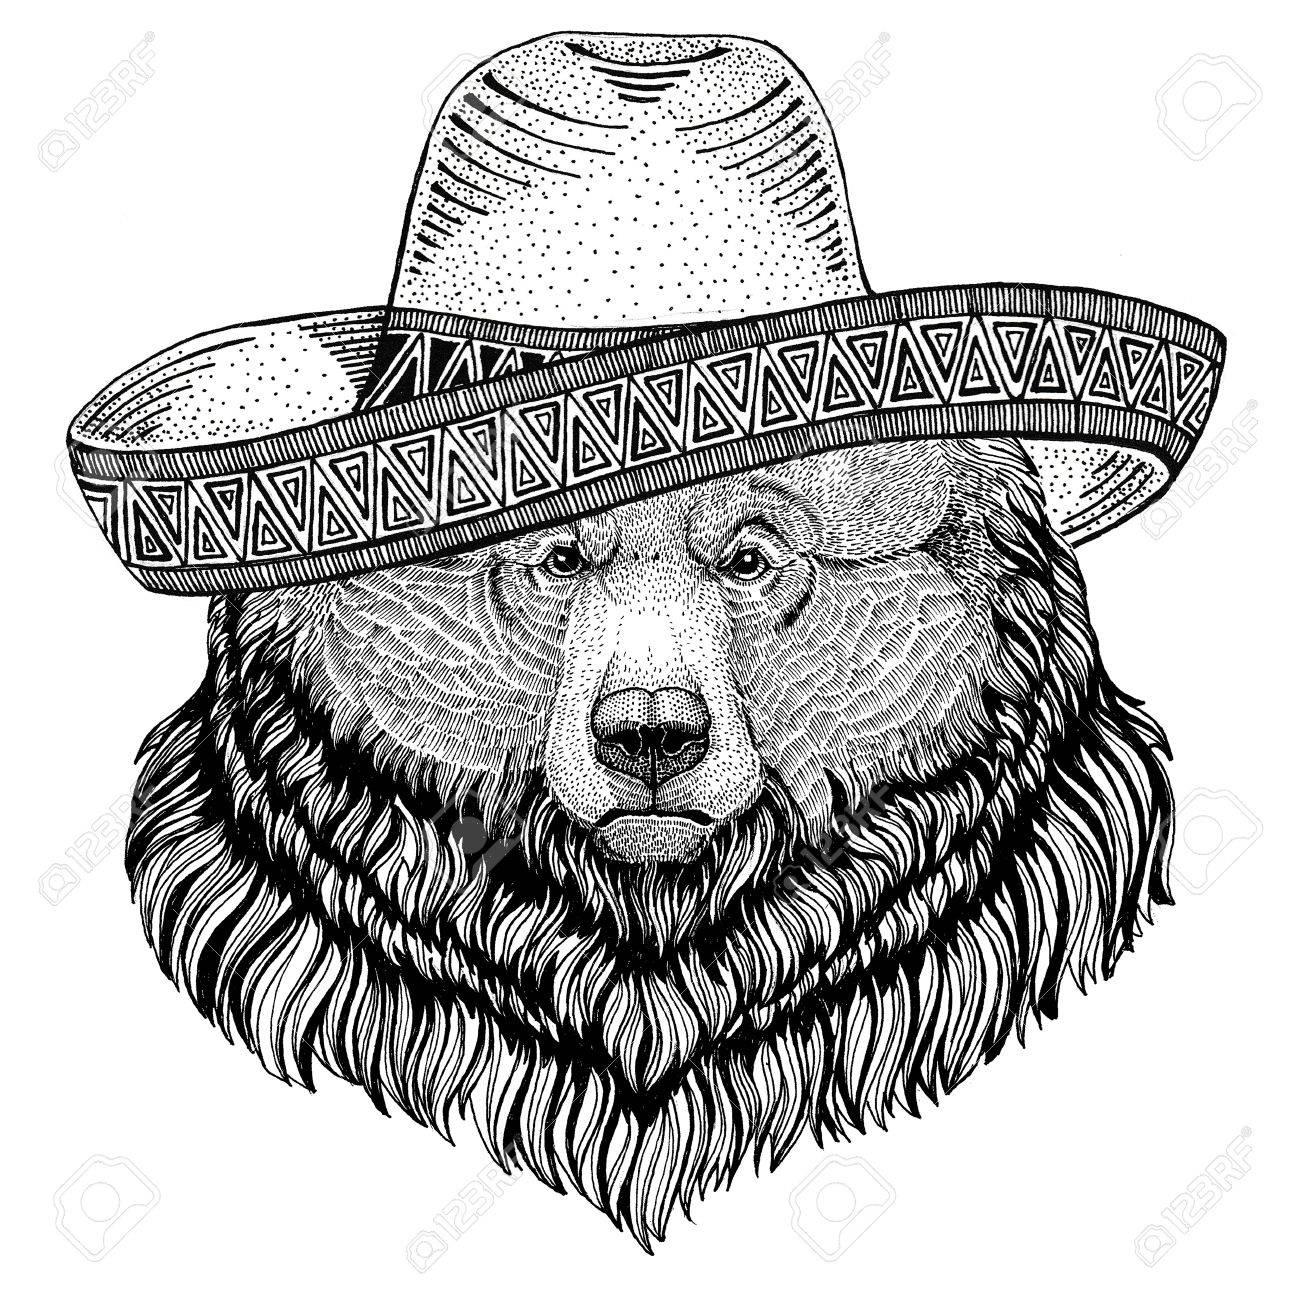 1300x1300 Grizzly Bear Big Wild Bear Wild Animal Wearing Sombrero Mexico